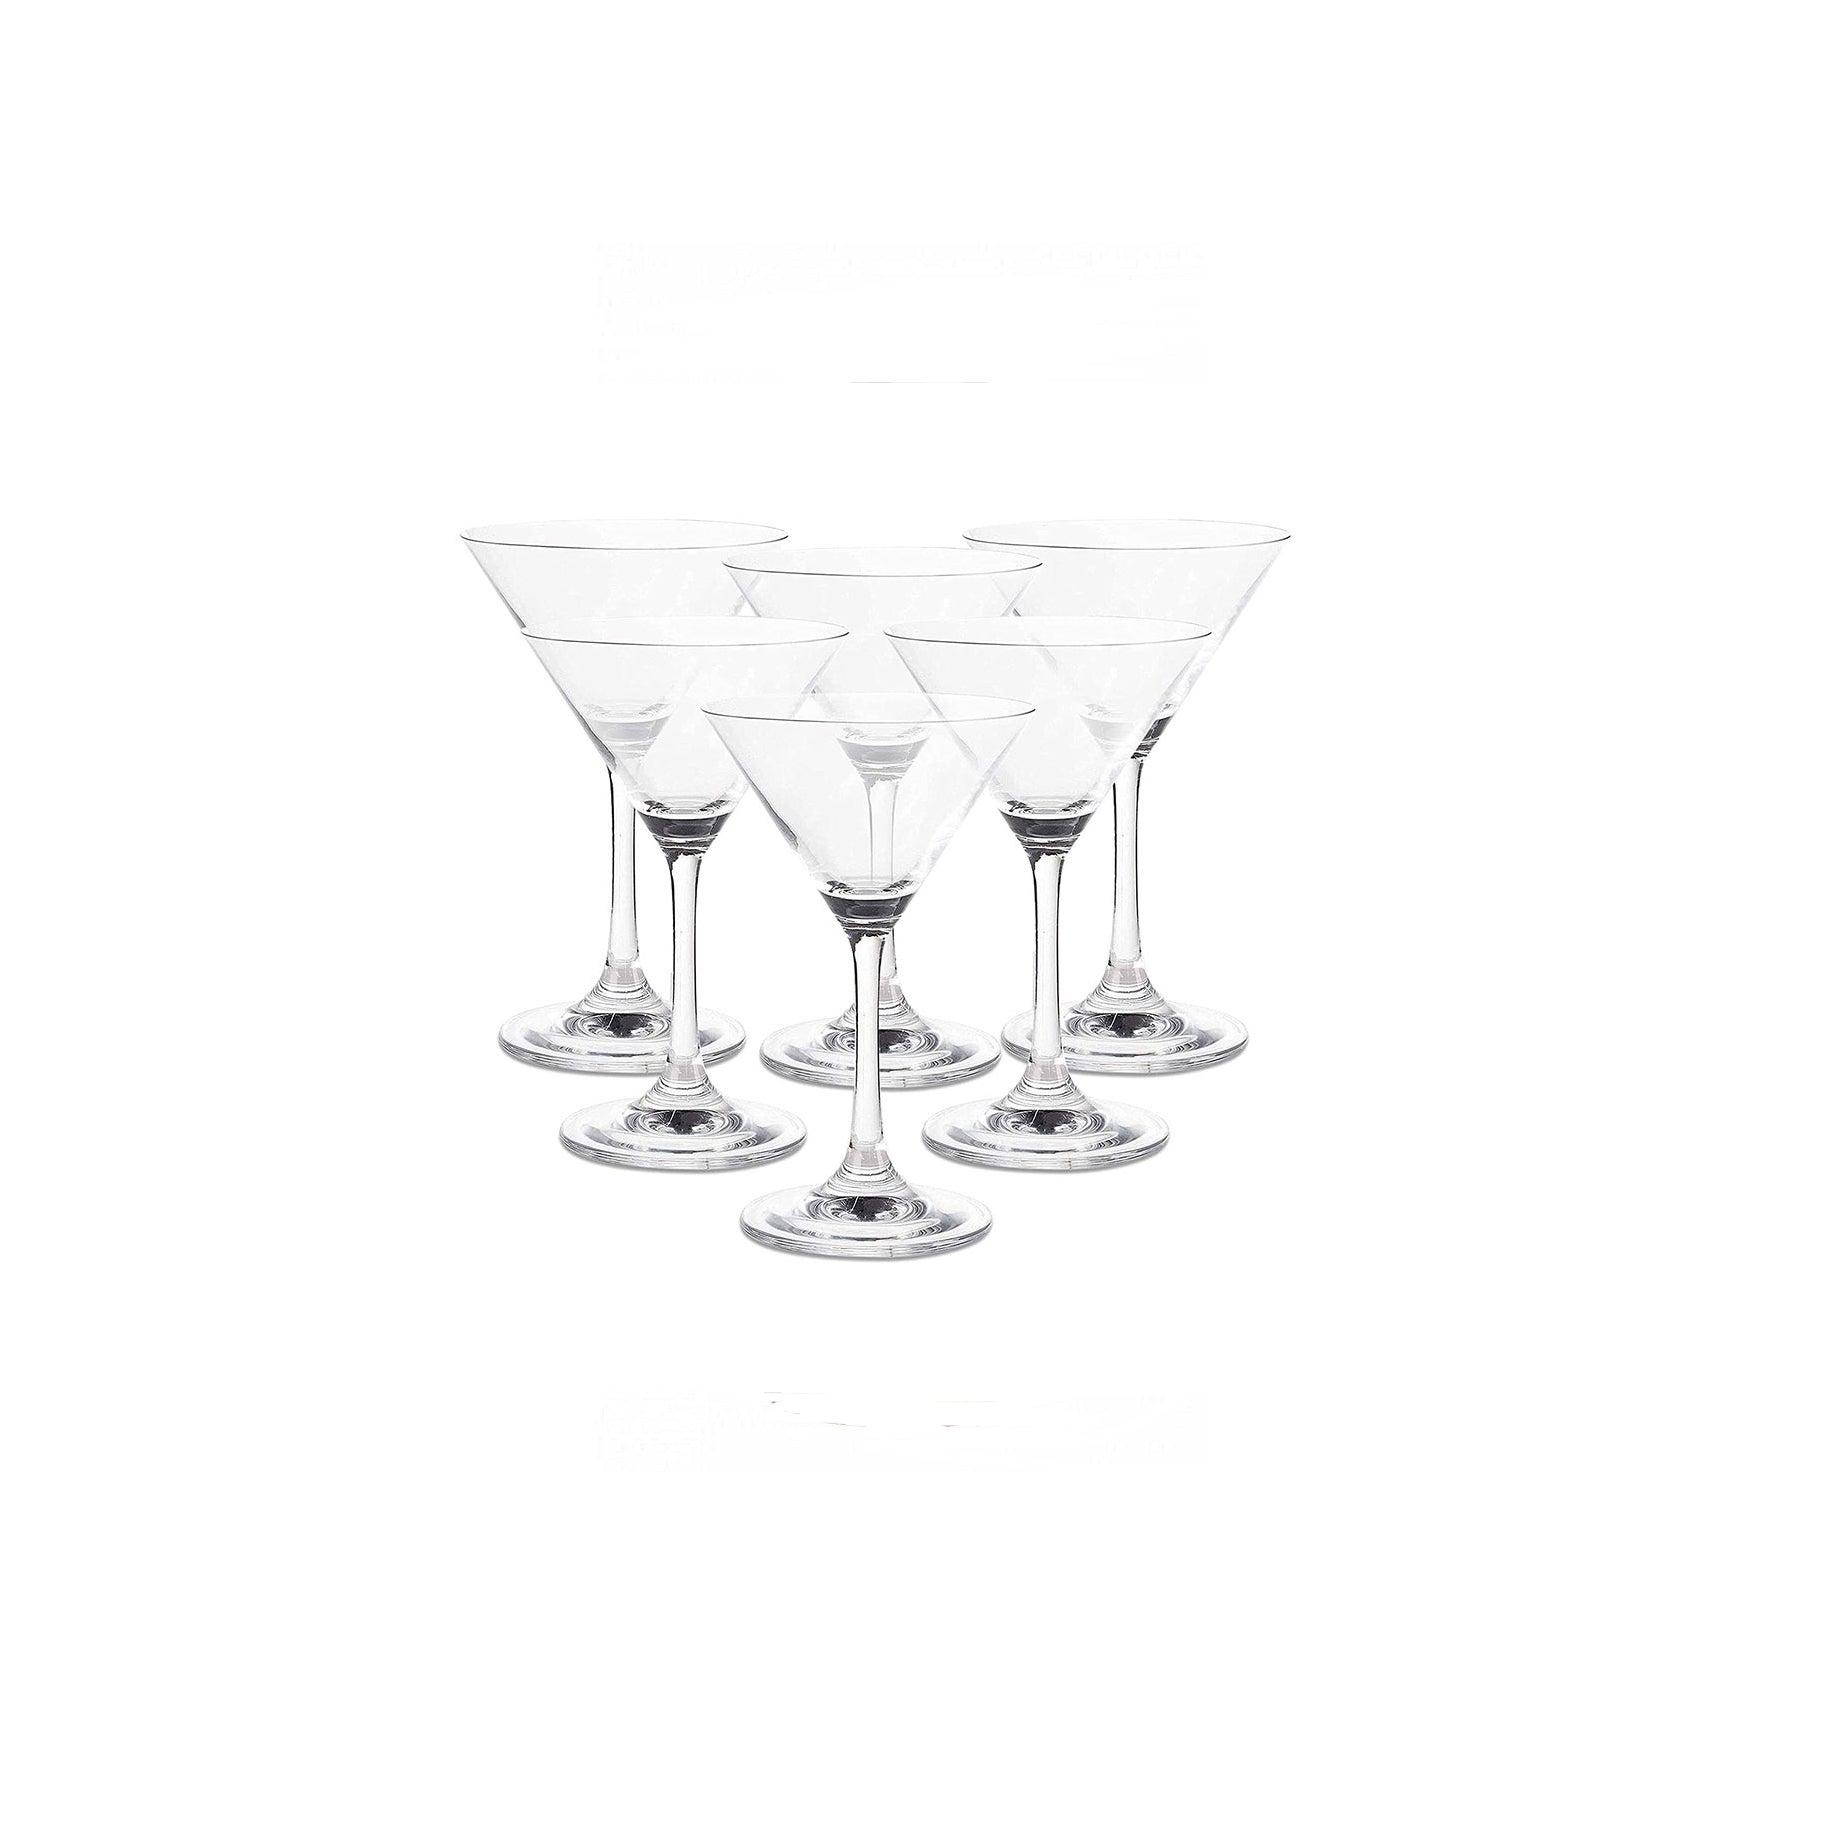 The Best Martini-Glass Option: Set of 6 Classic Martini Glasses